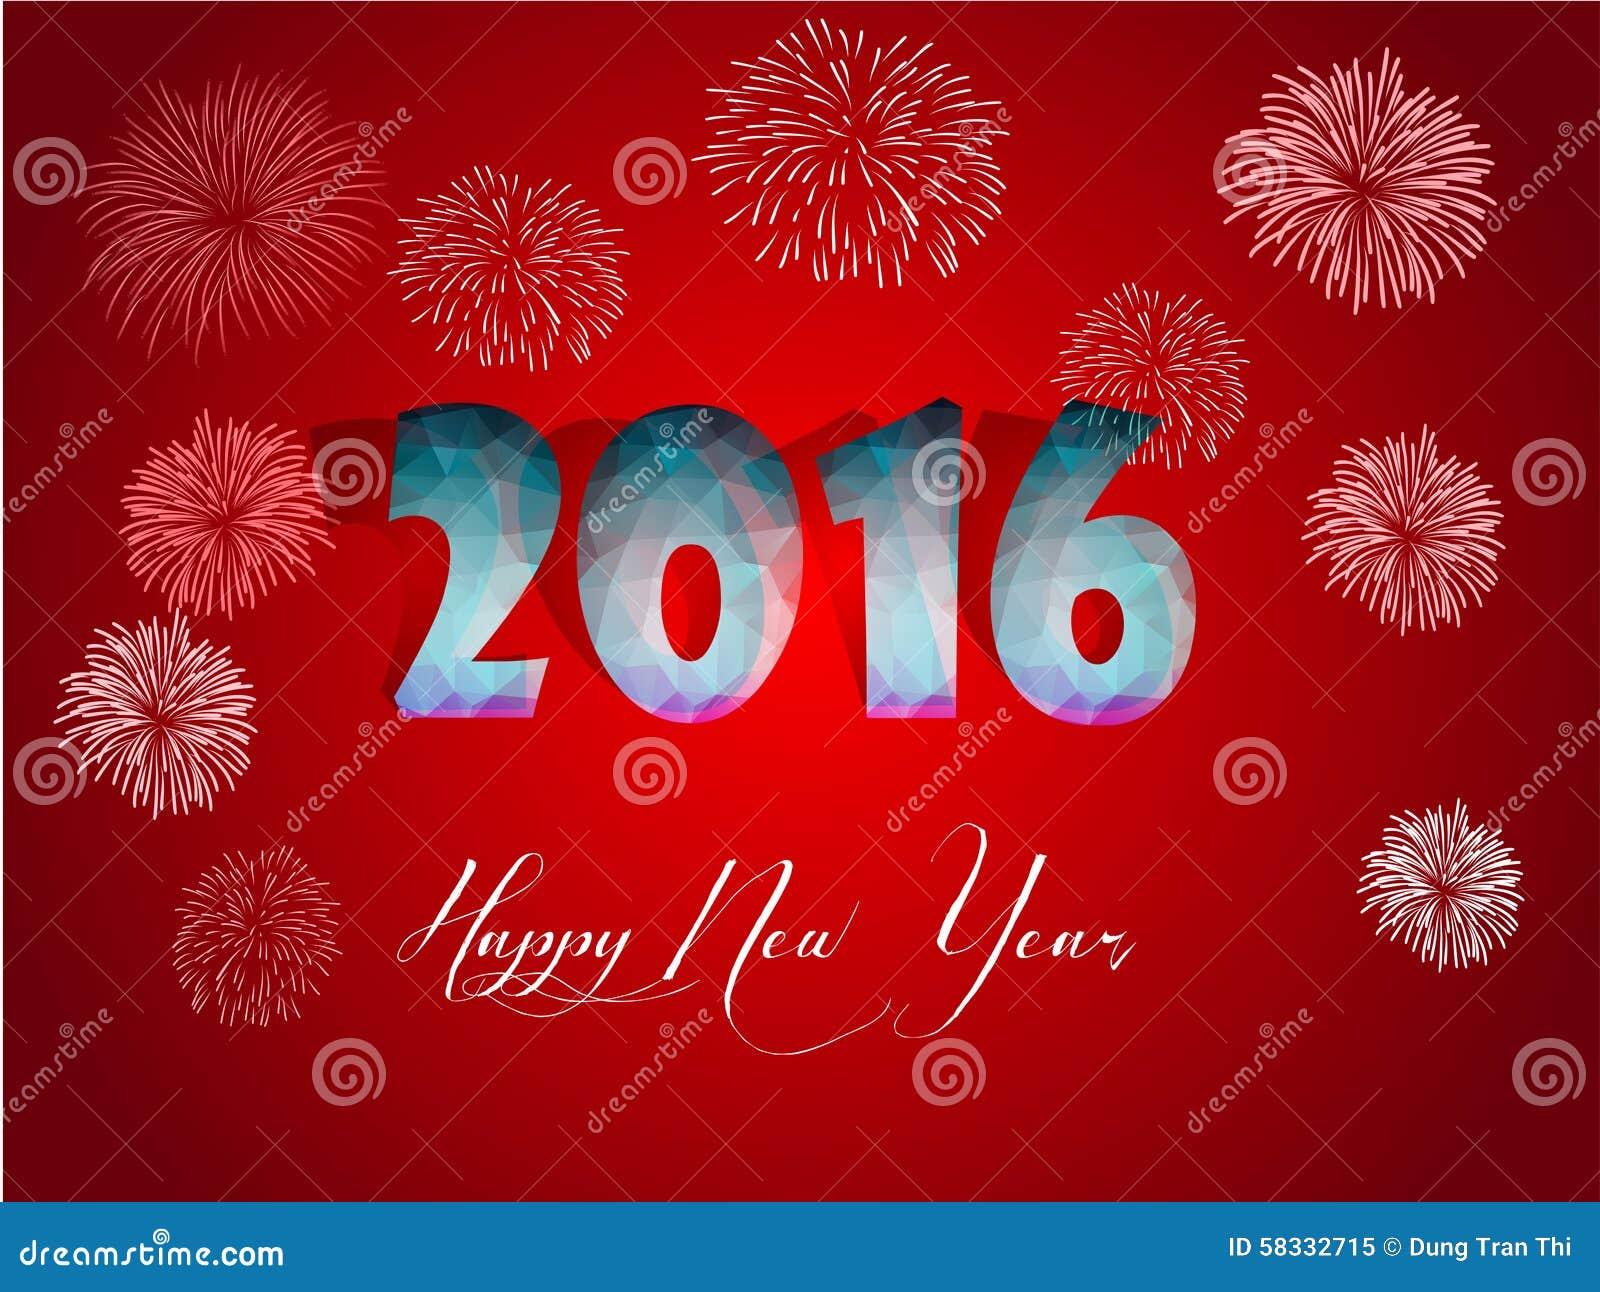 Happy new year 2016 greeting card stylized triangle polygonal happy new year 2016 greeting card stylized triangle polygonal model kristyandbryce Choice Image